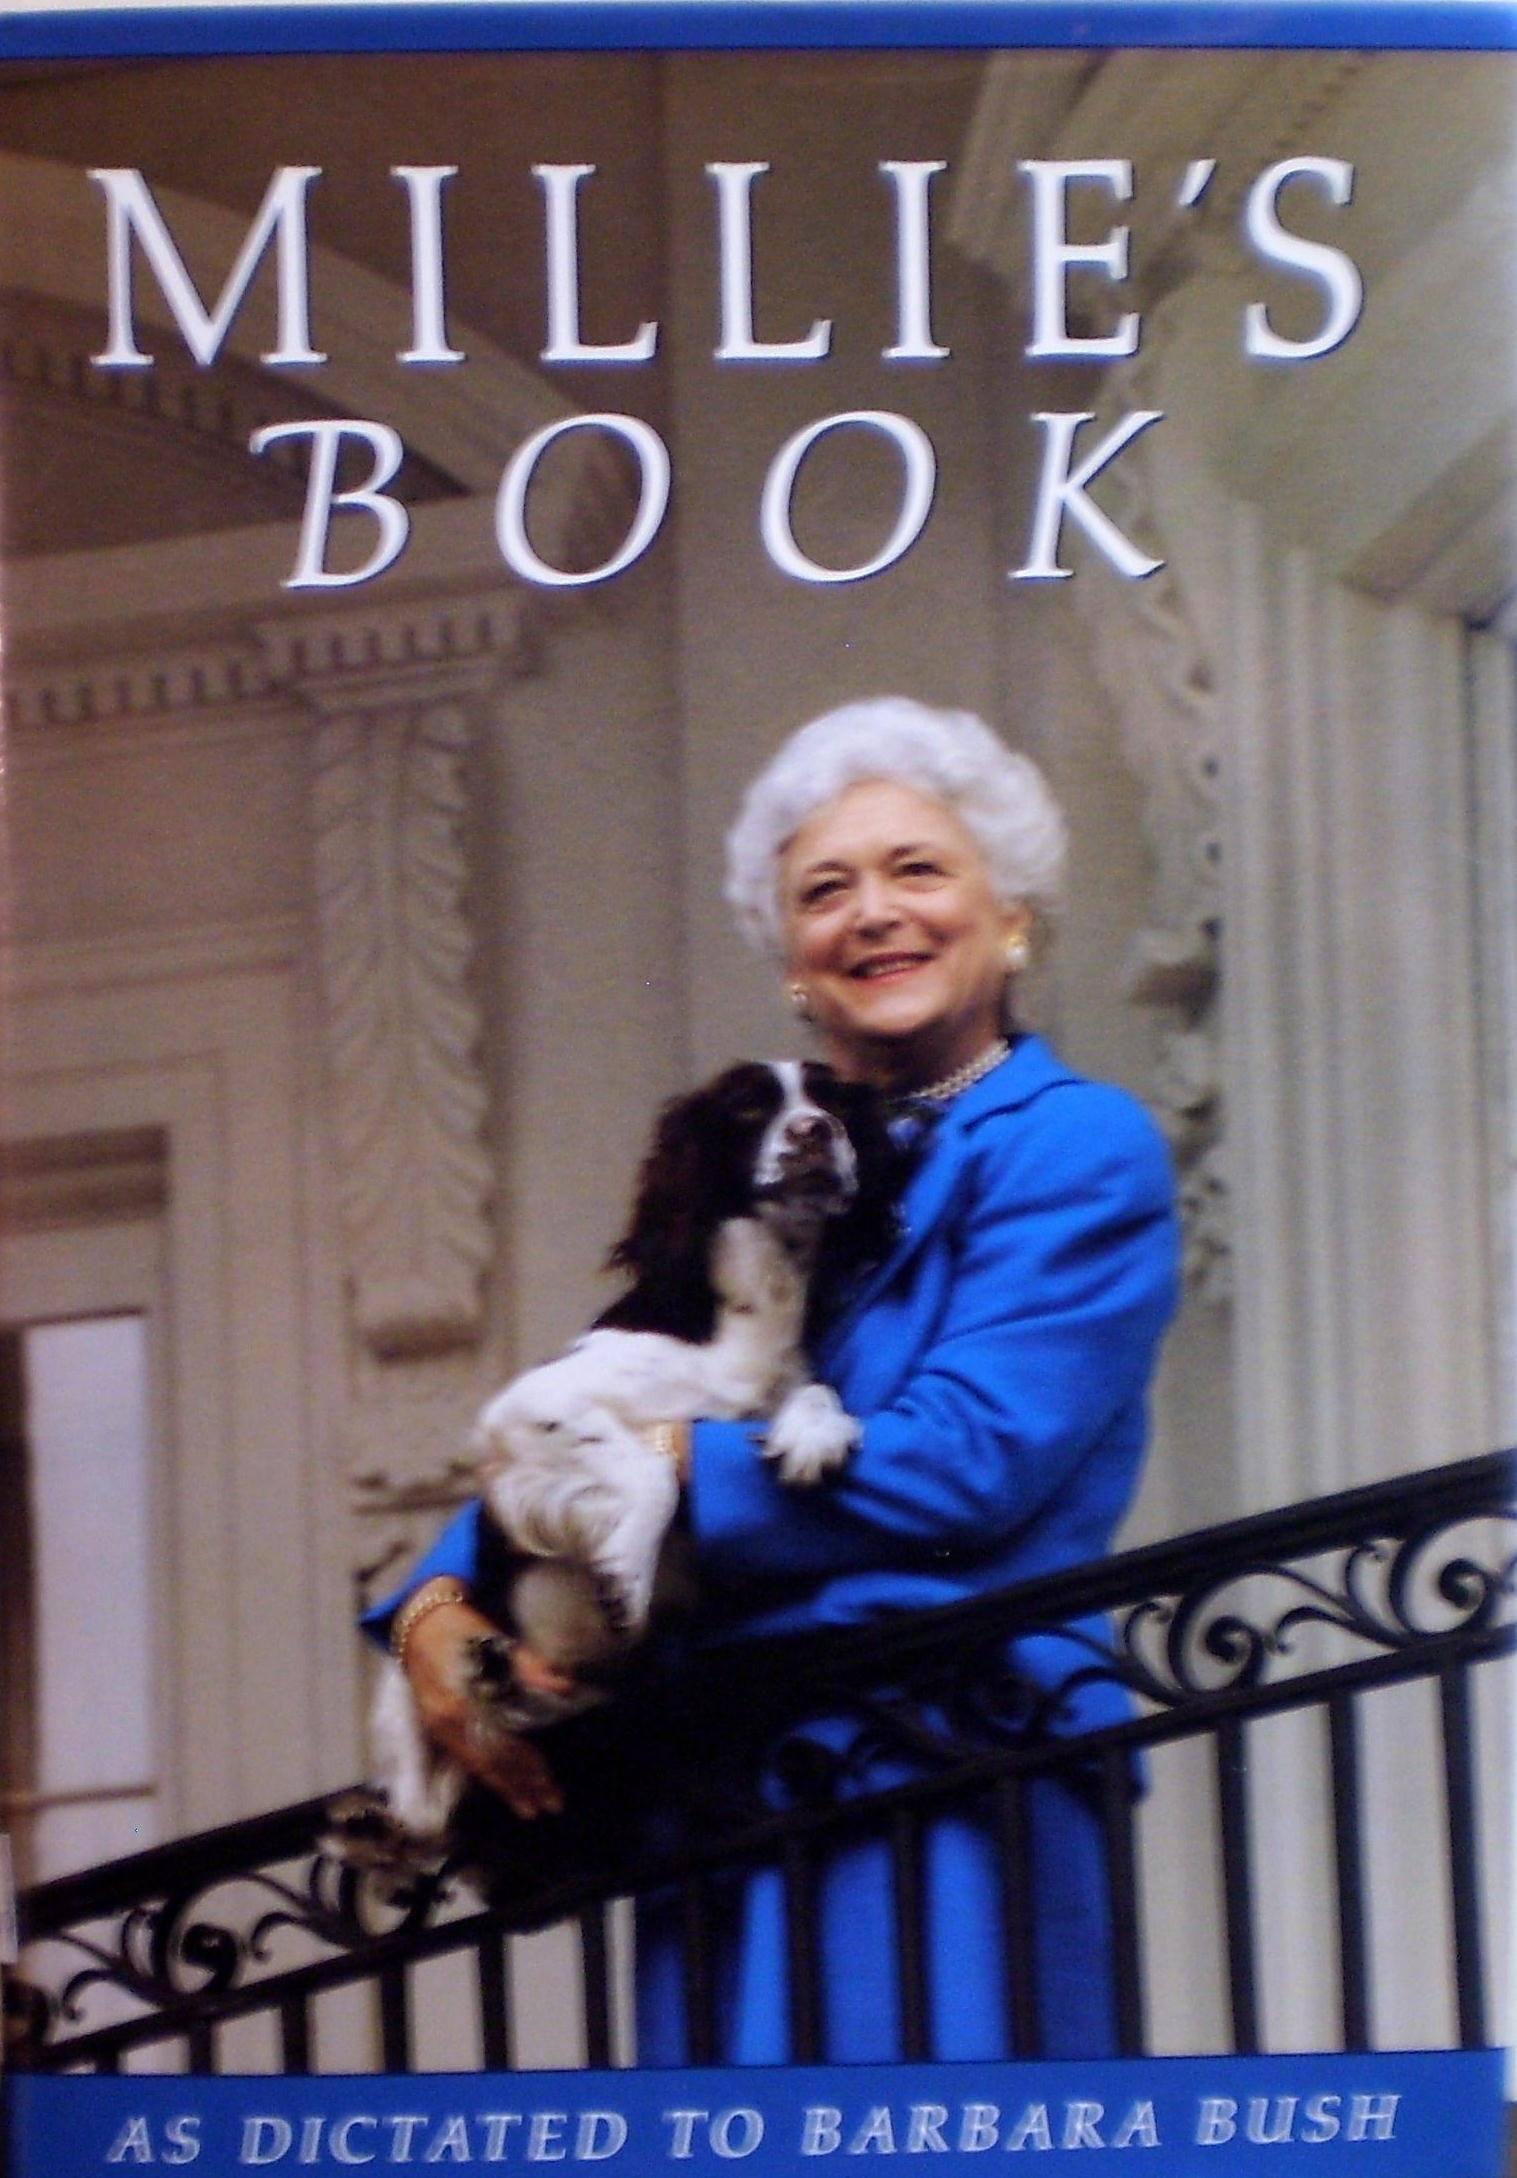 Millie's Book by Barbara Bush